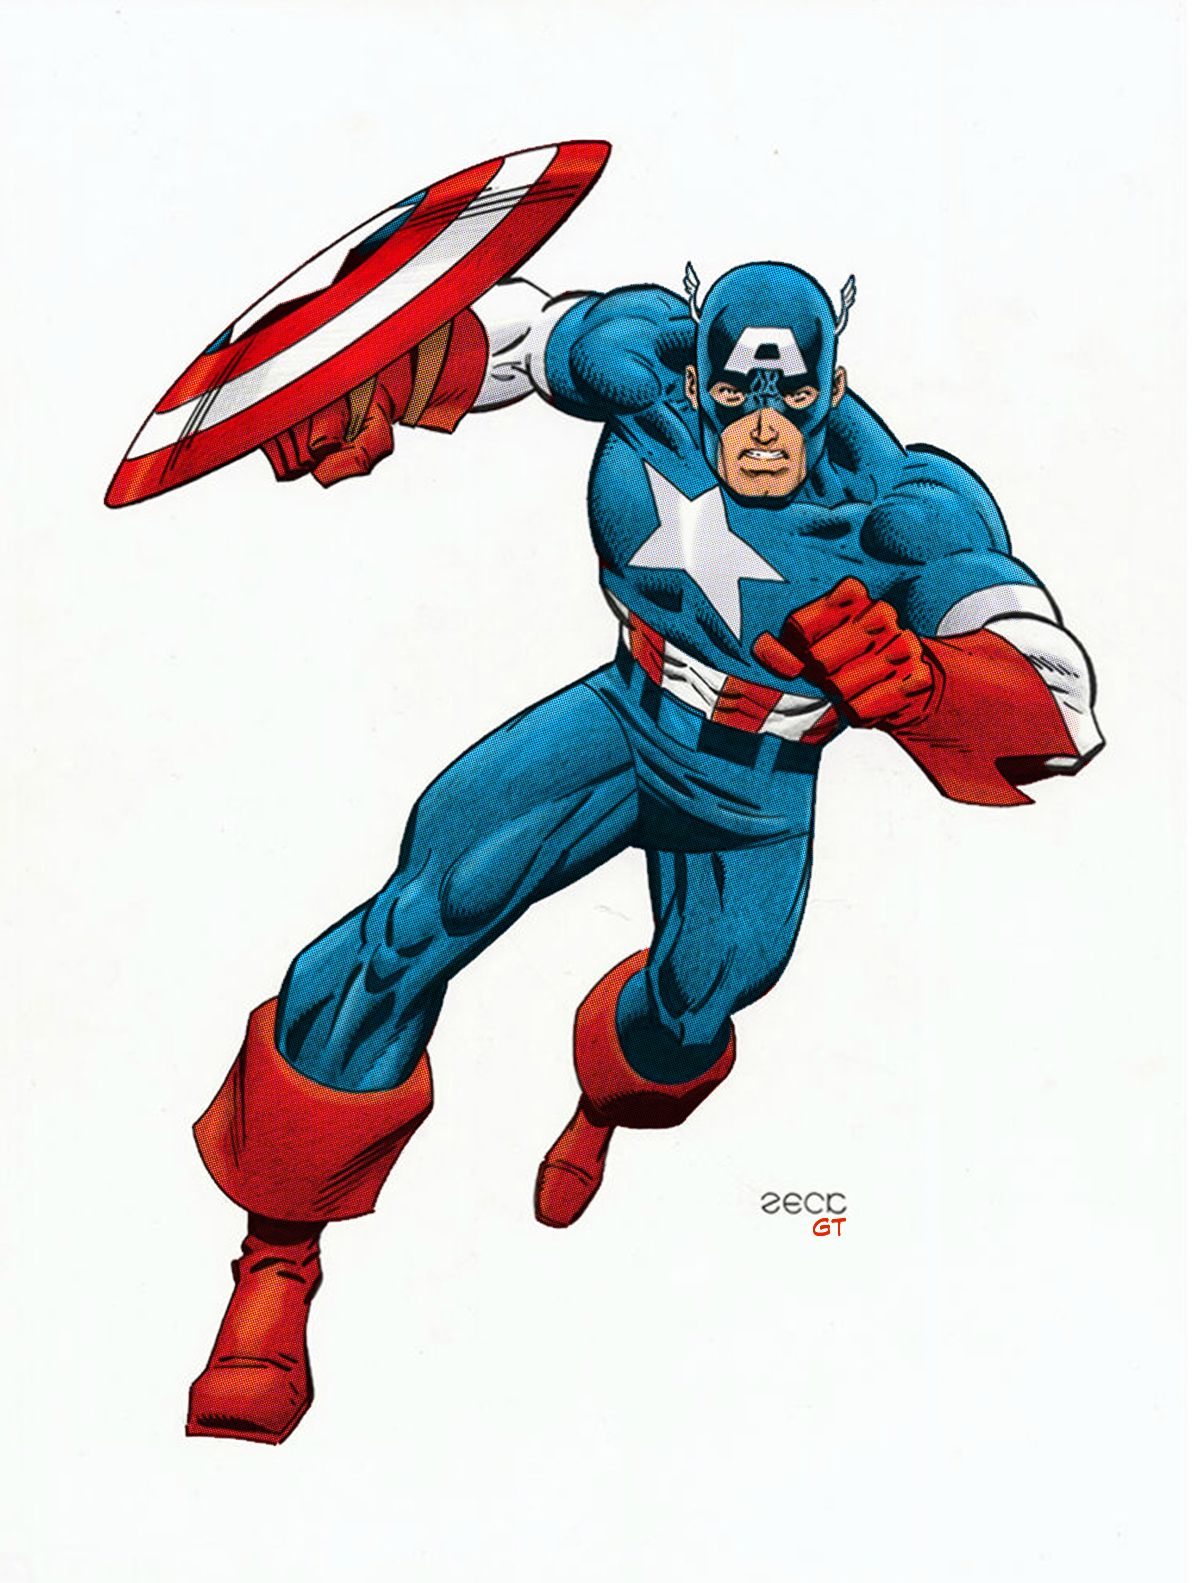 Pin by garrett arakawa on super heroes dessin anim - Dessin anime avengers ...